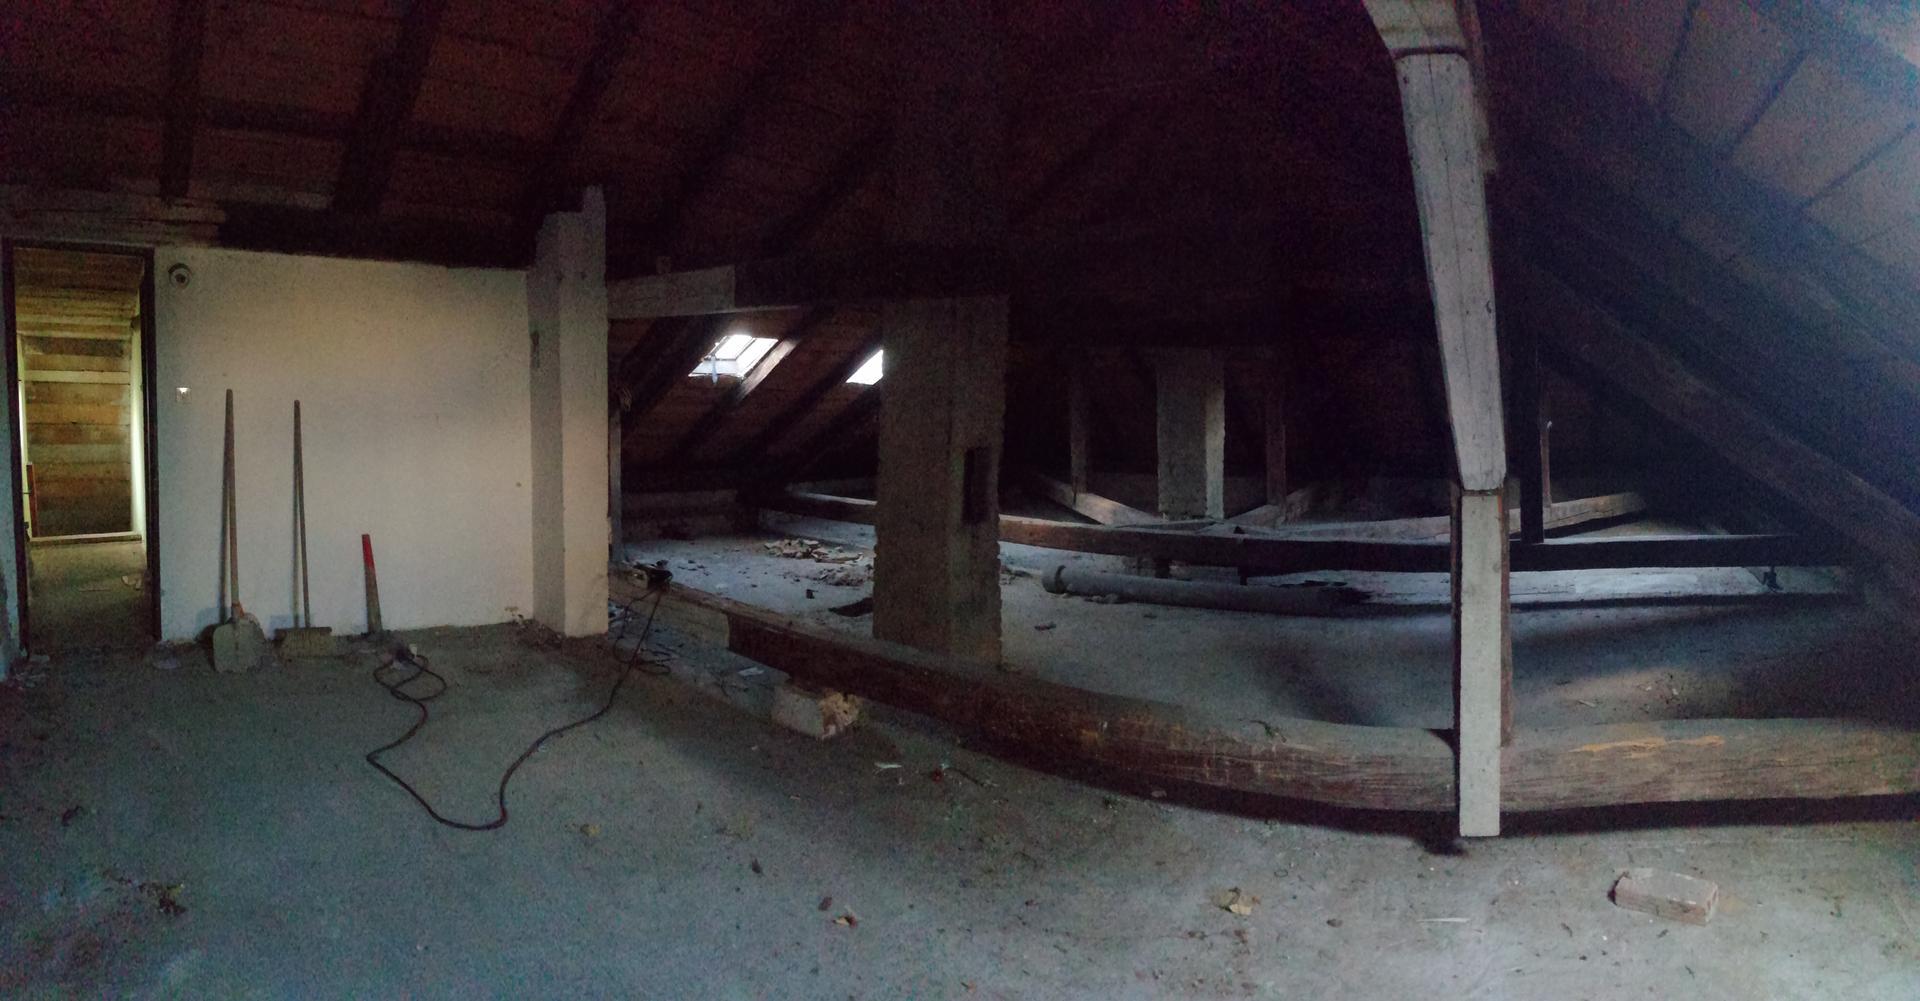 Prestavba podkrovia zo sedlovo valbovej na sedlovú strechu. - Obrázok č. 29